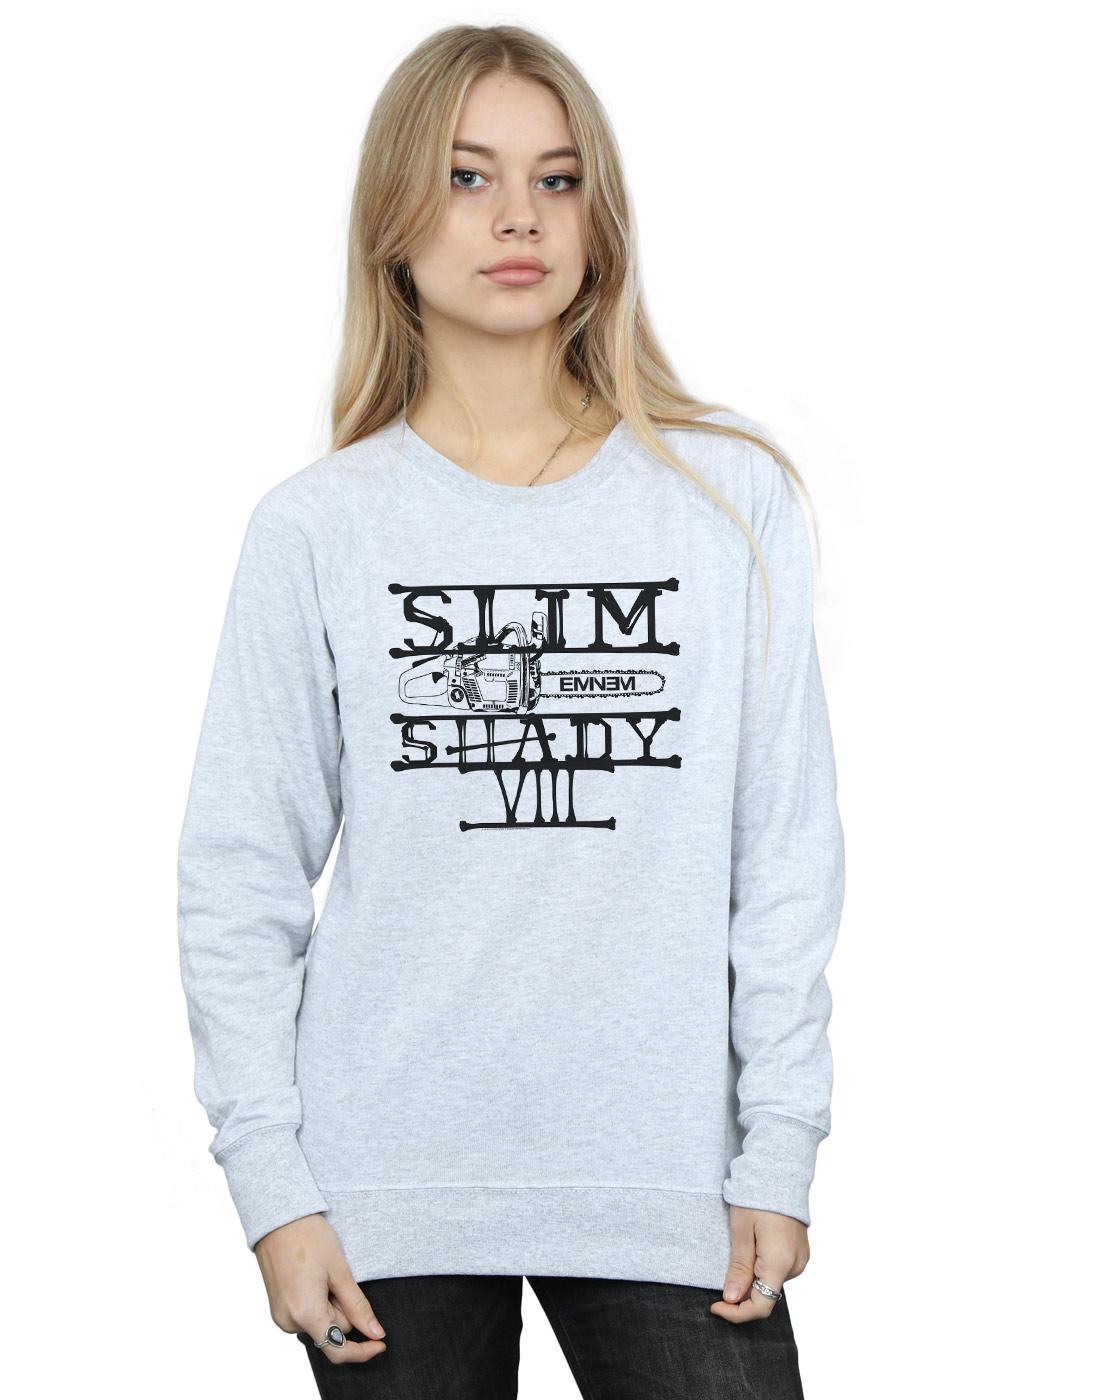 6b3ce598bae73c Eminem Women s Slim Shady Chainsaw Sweatshirt